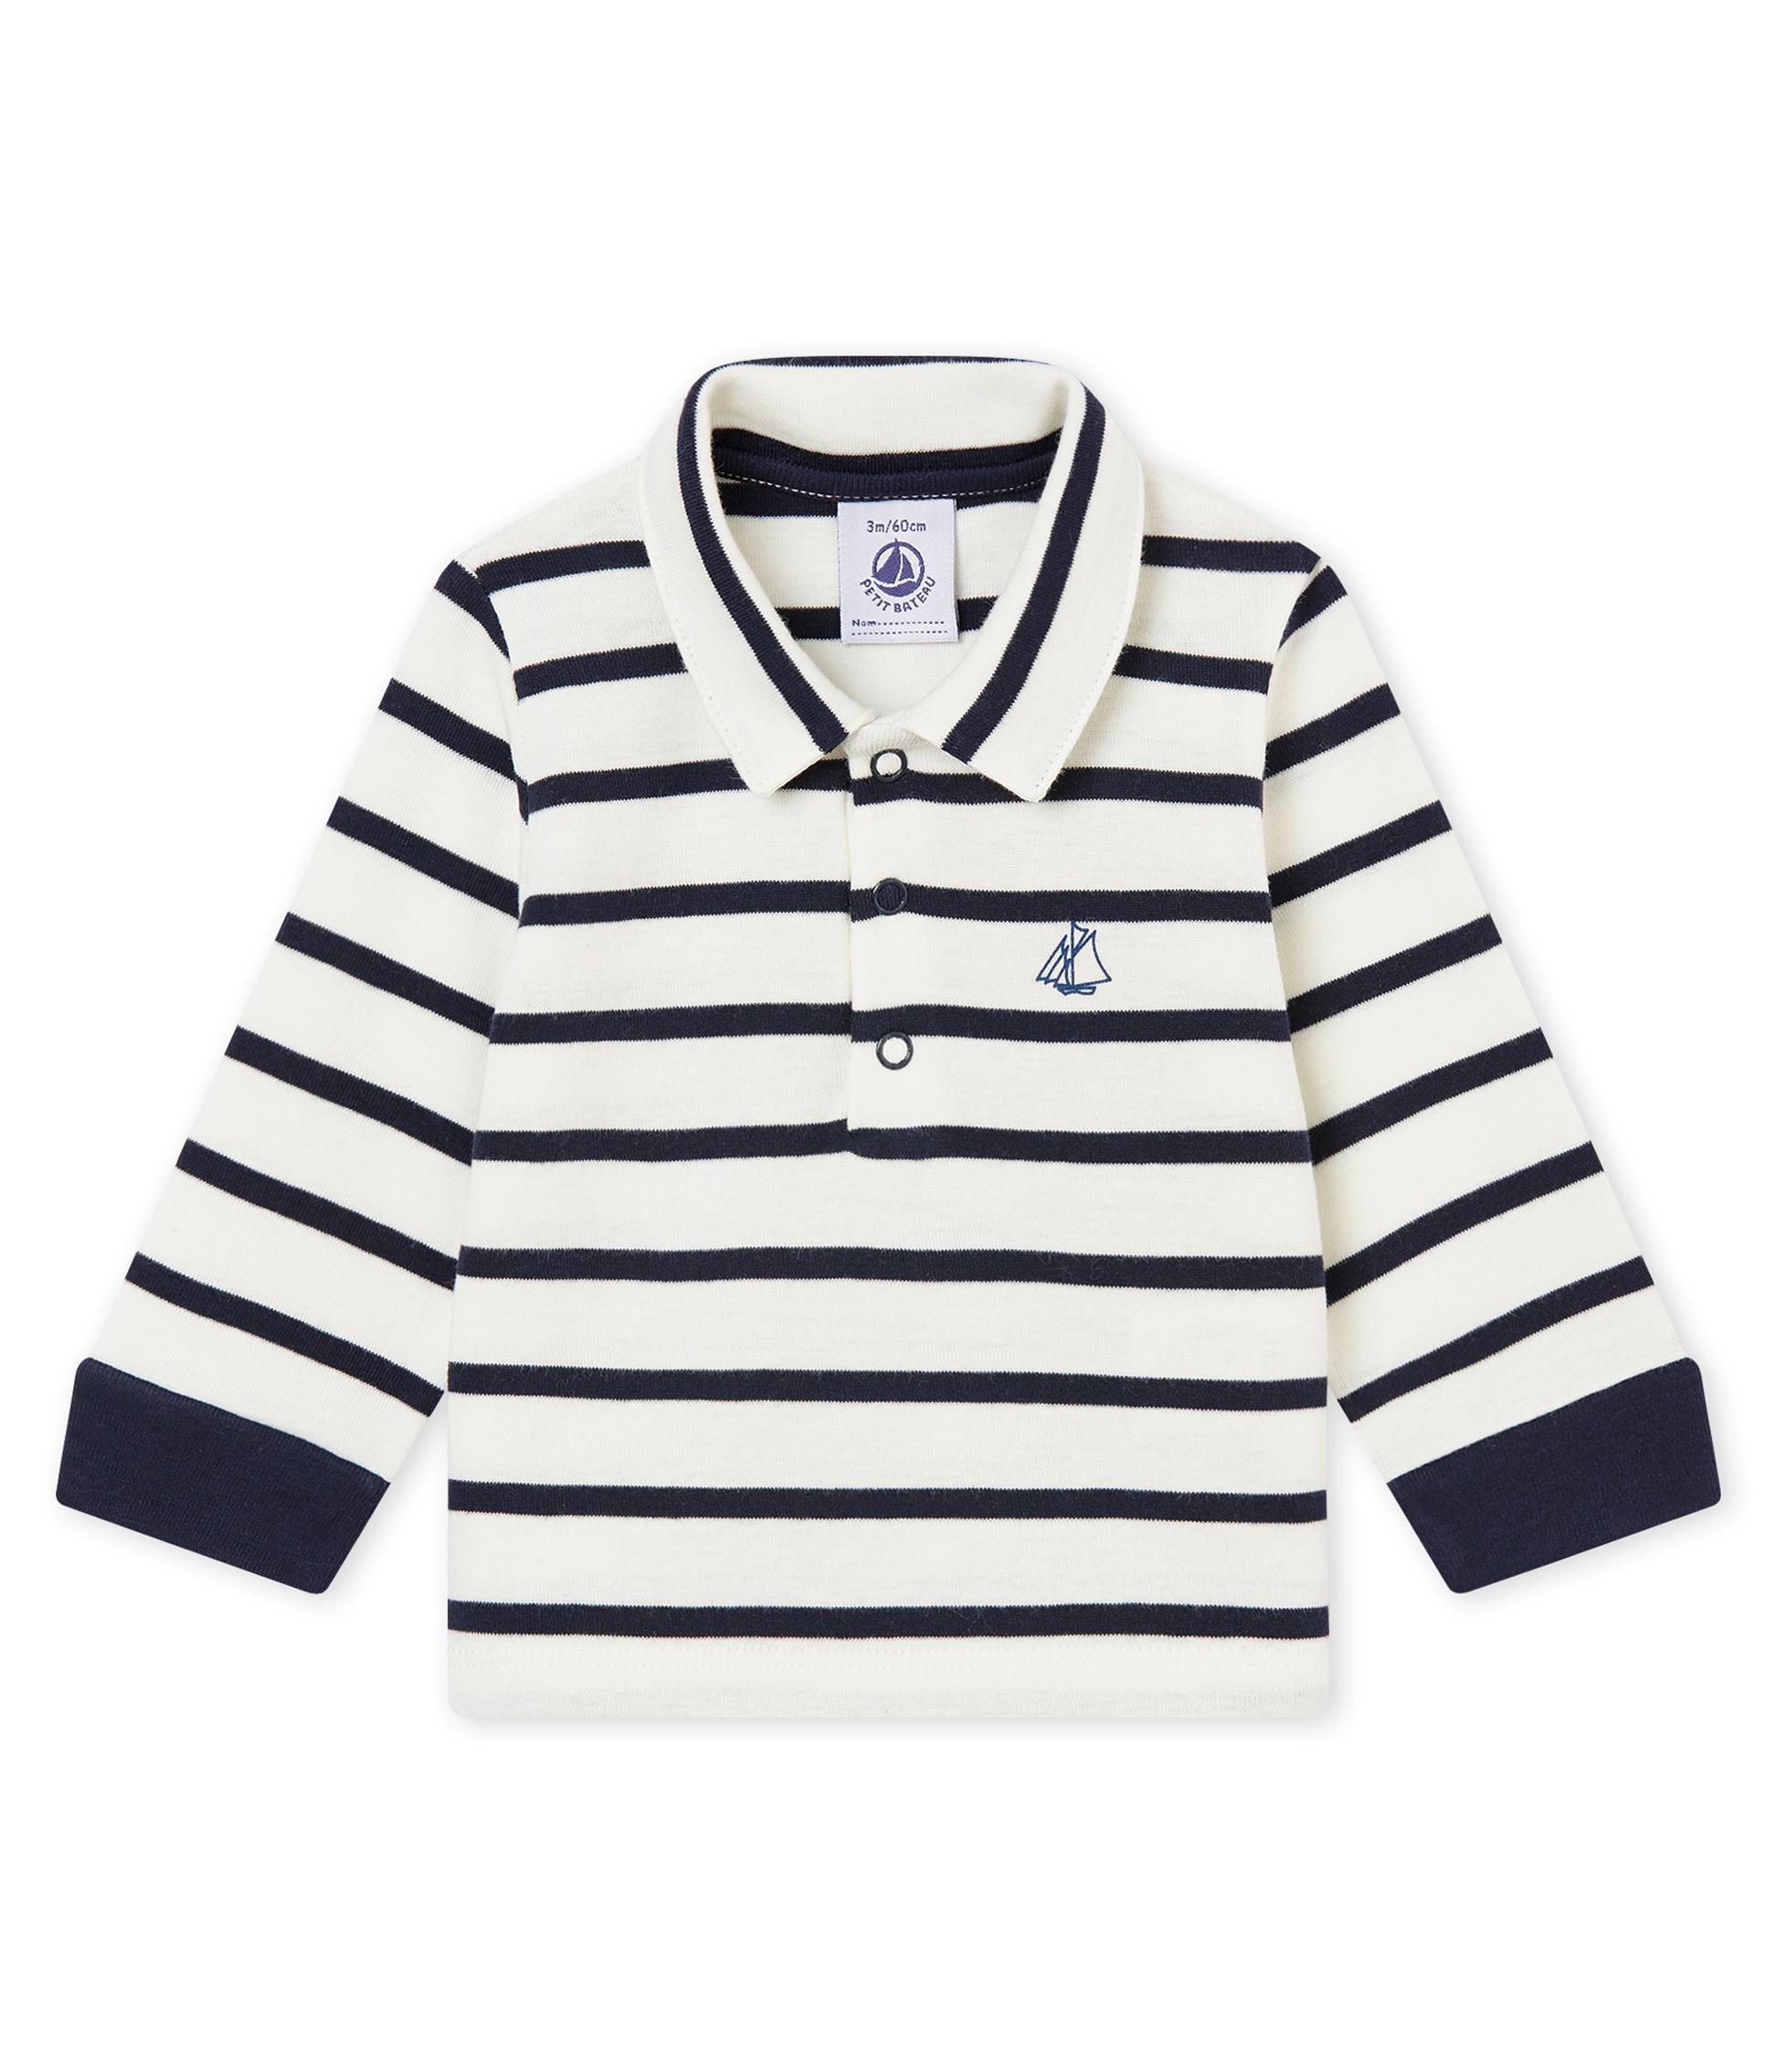 512df14aa Polo a rayas marineras para bebé niño | Petit Bateau